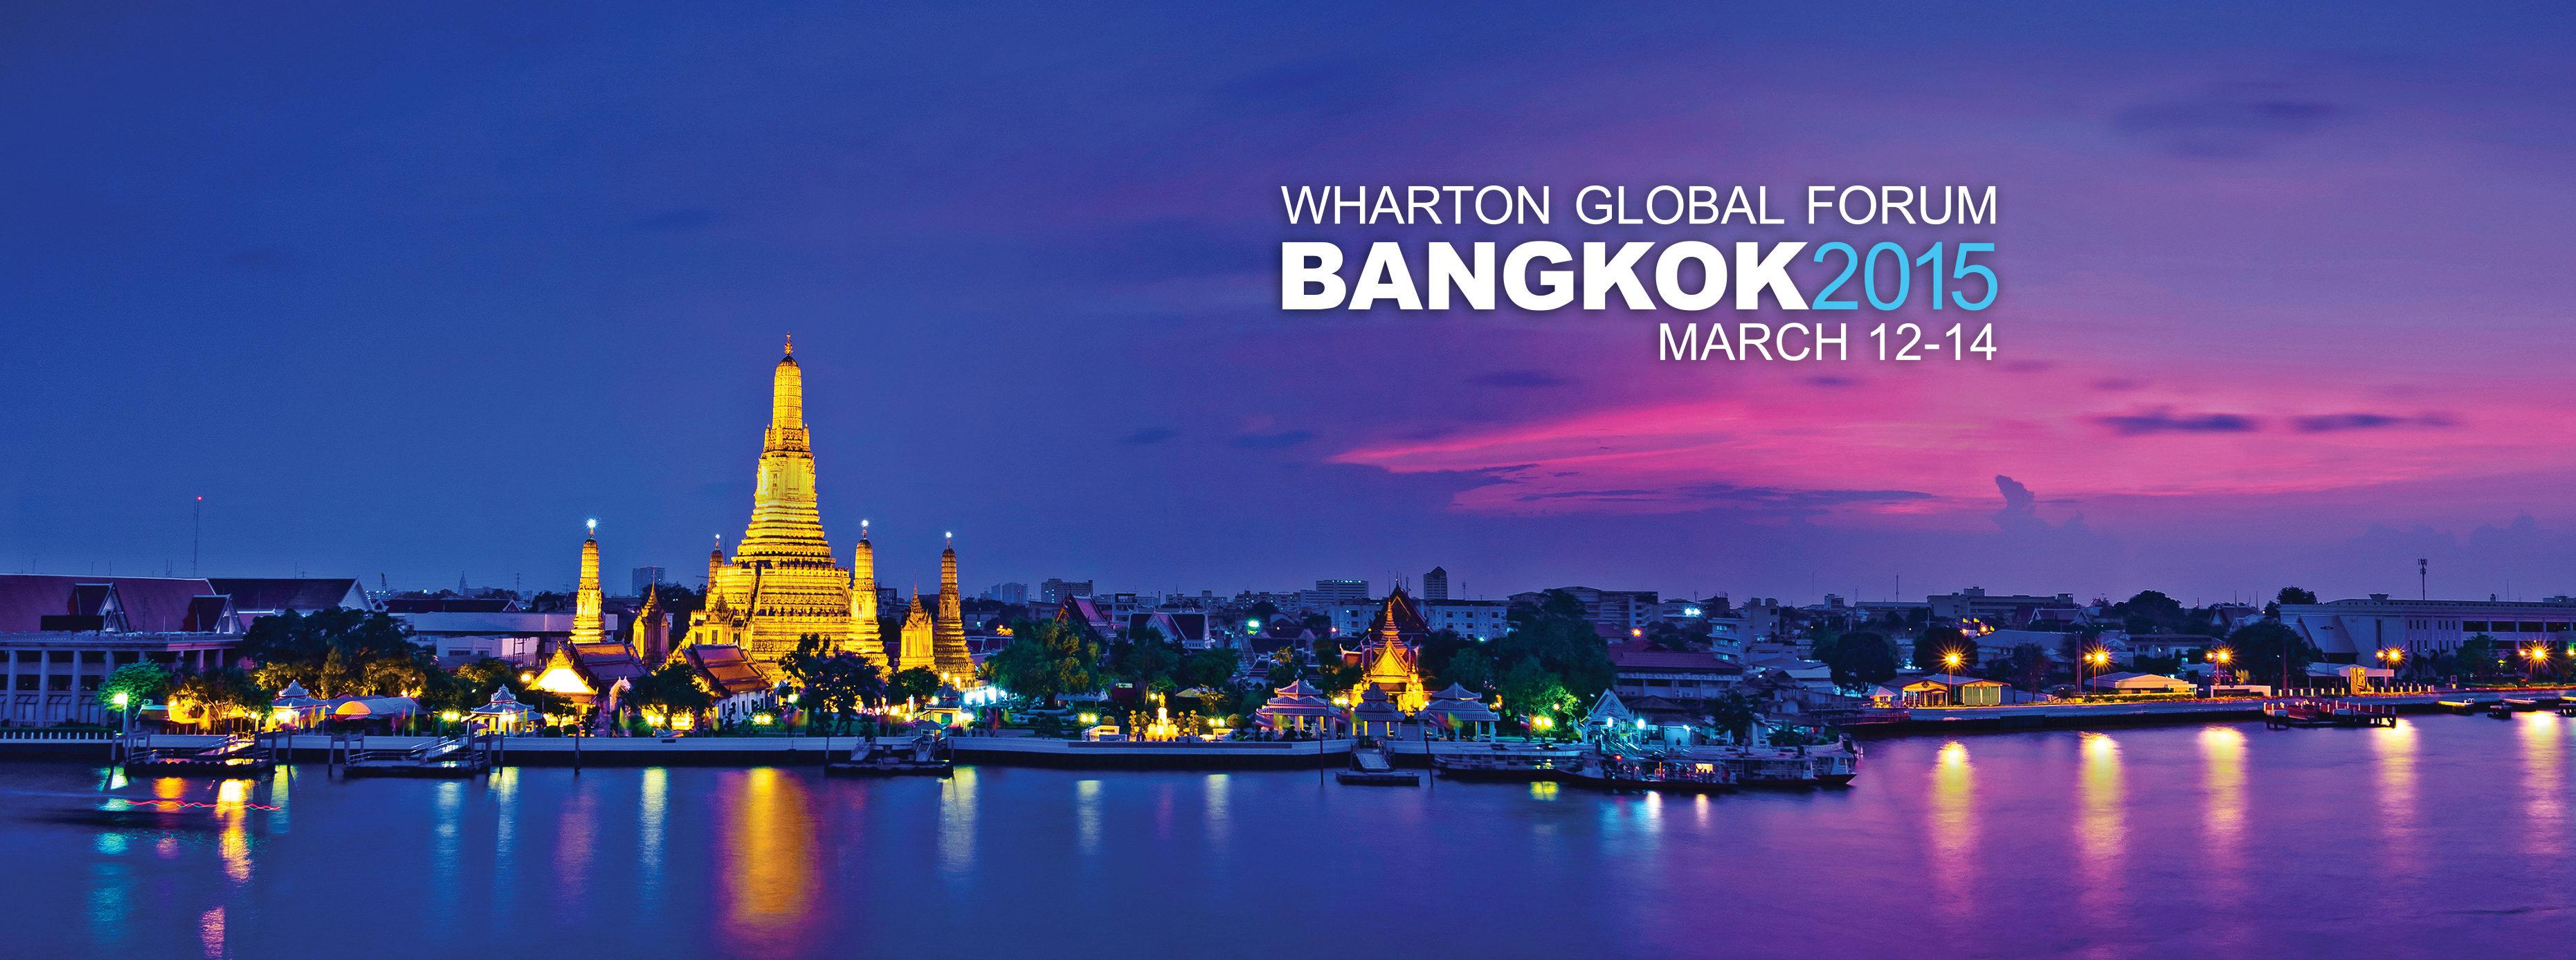 Wharton Global Forum Bangkok